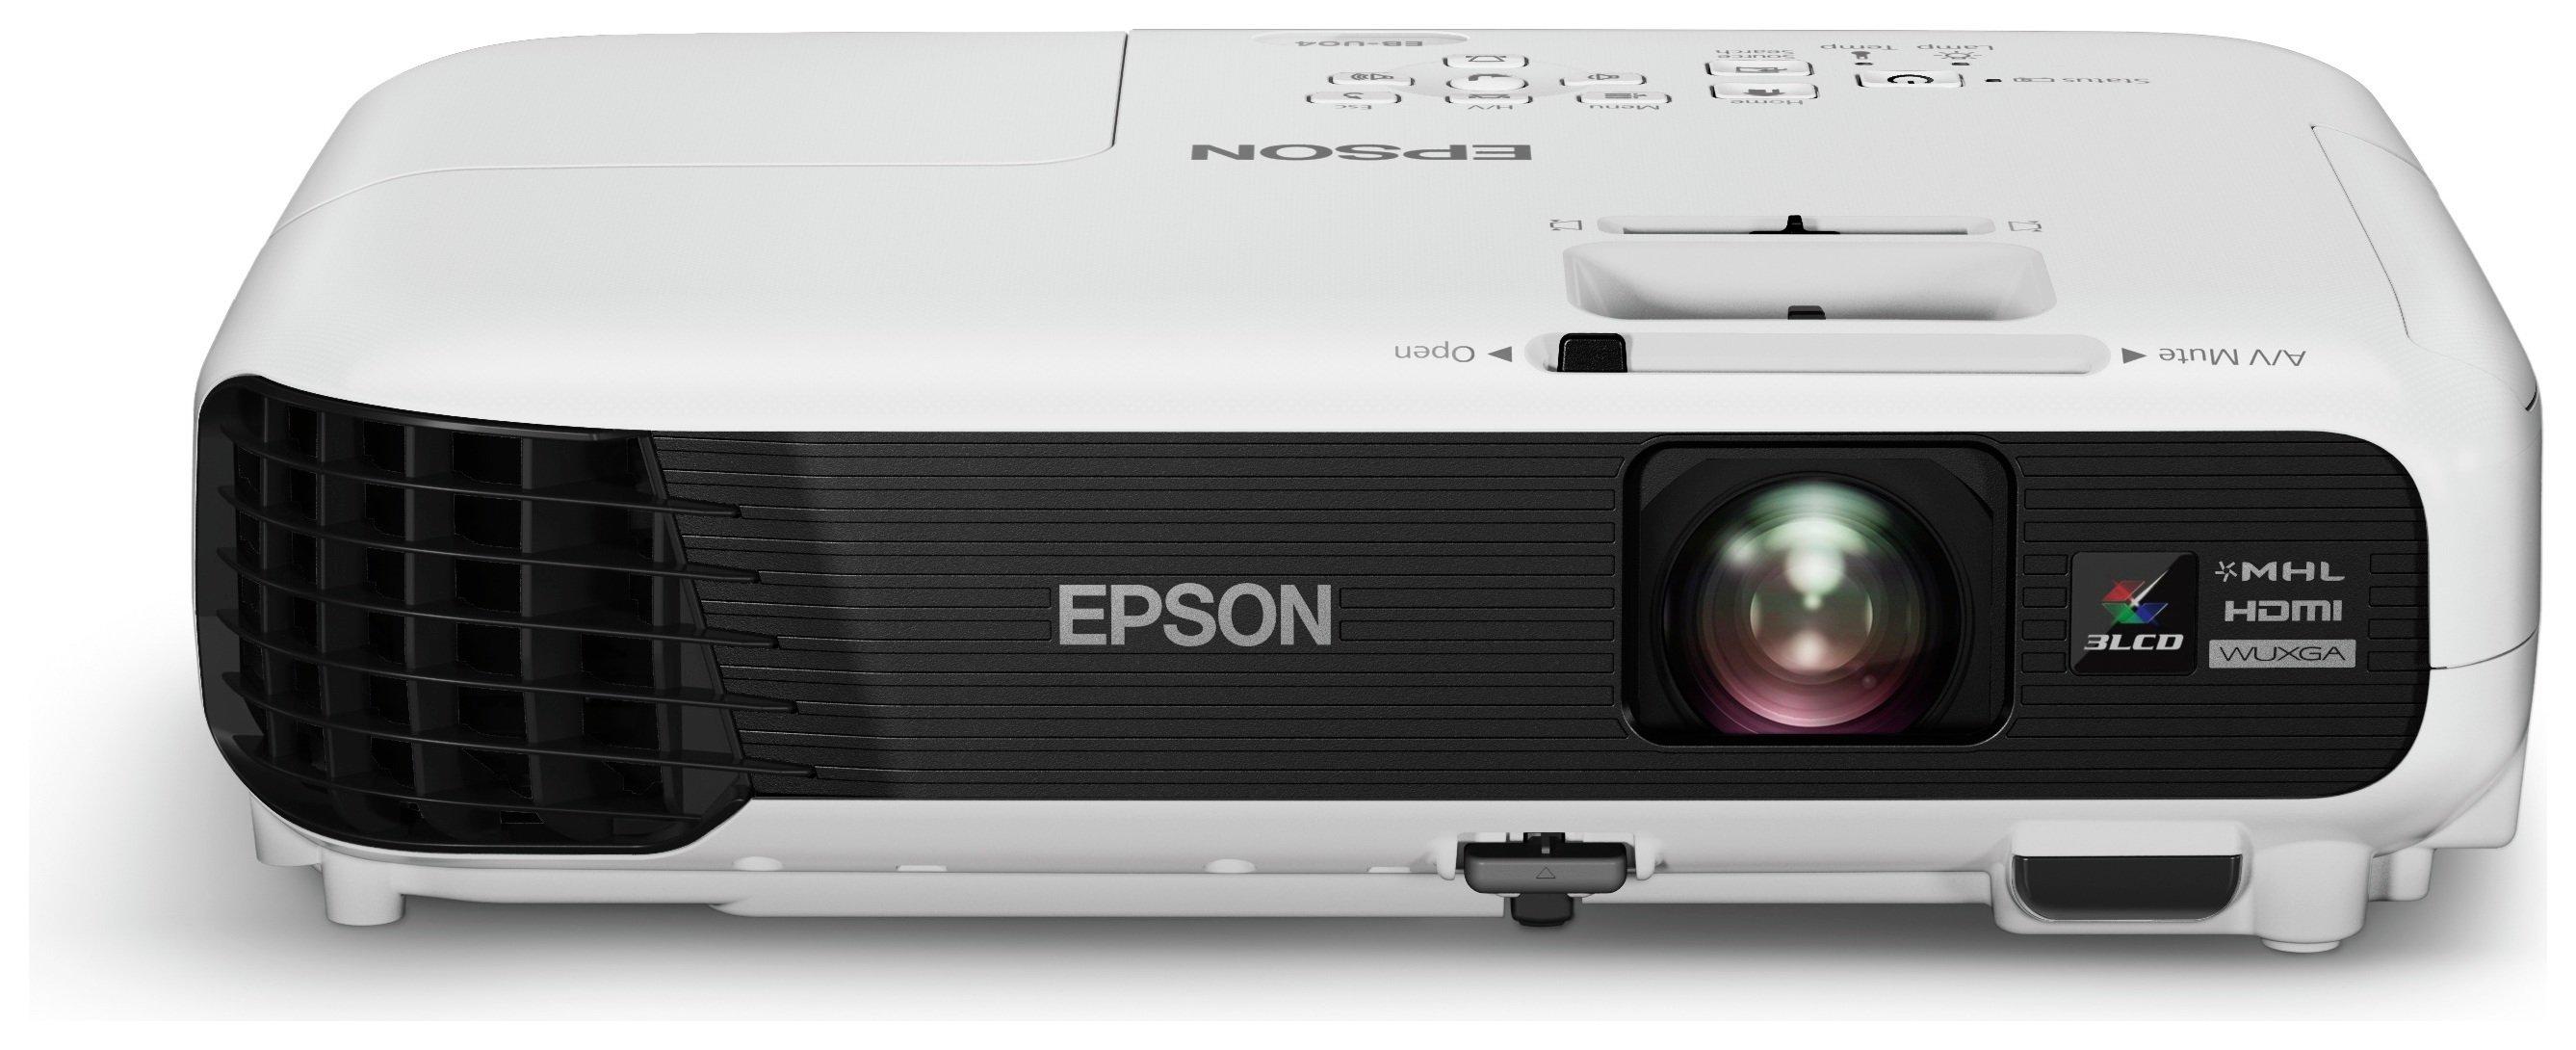 epson ebu04 hd projector review. Black Bedroom Furniture Sets. Home Design Ideas